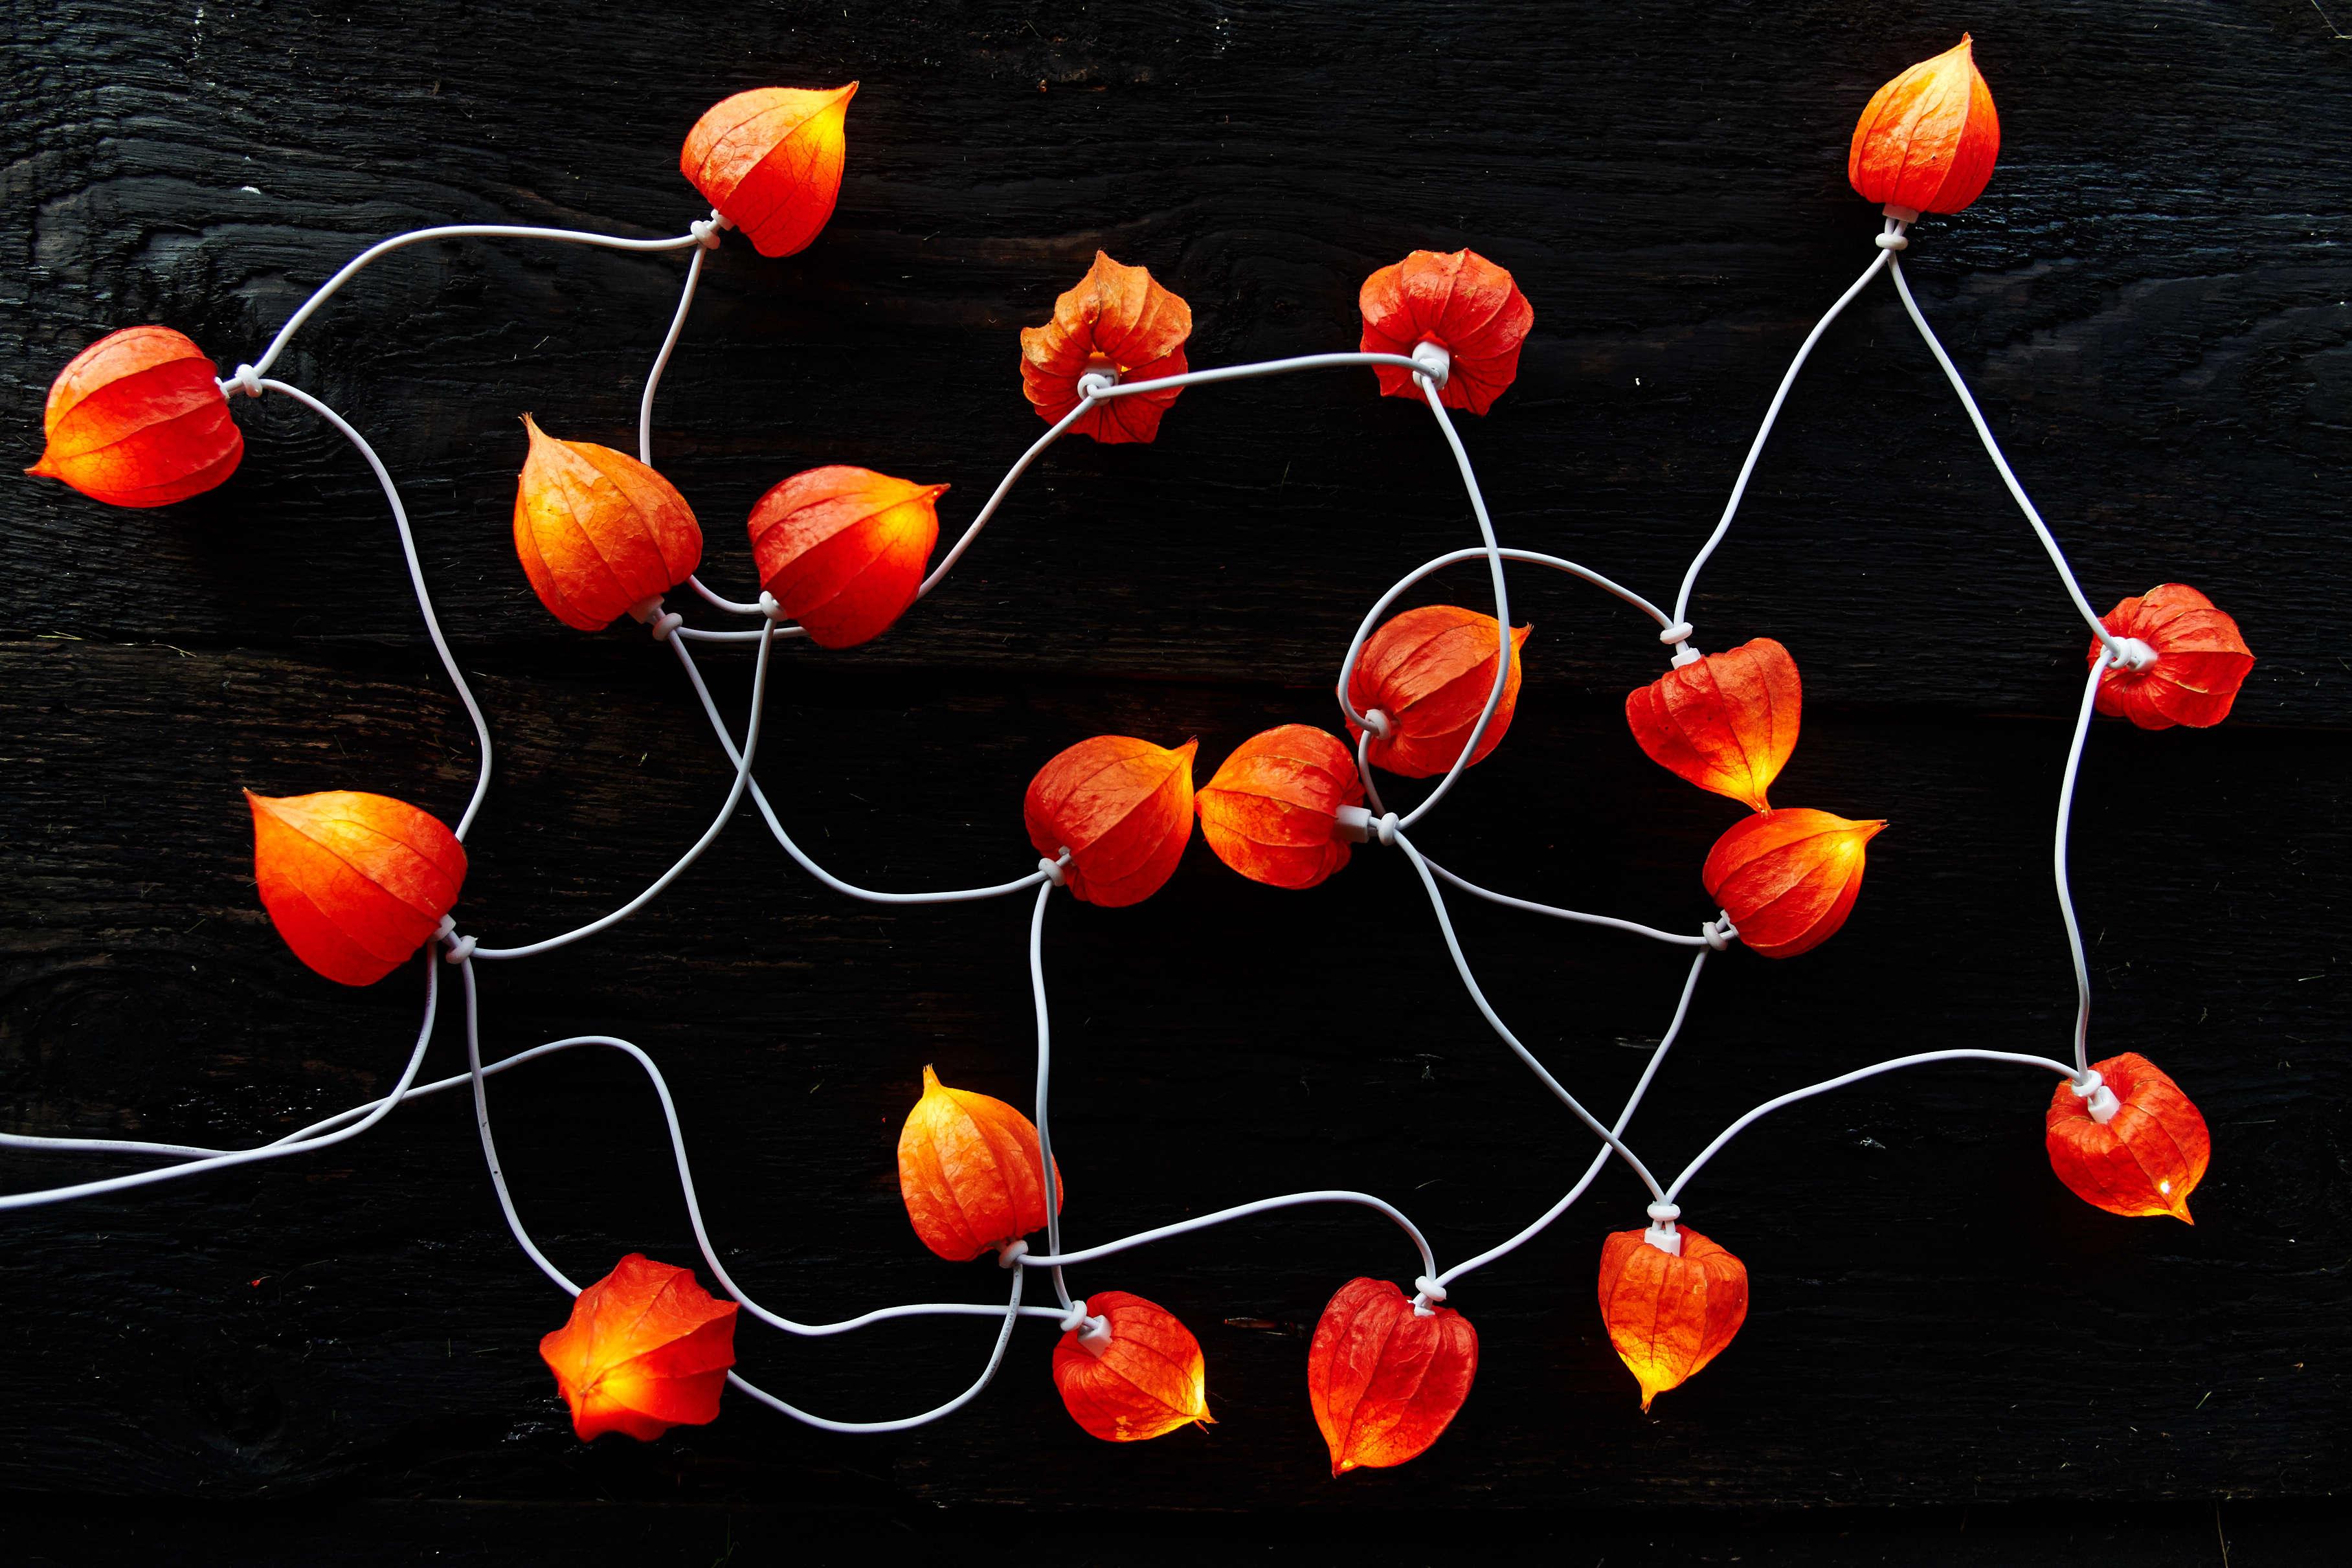 Diy Halloween String Lights : DIY: Pumpkin Lights Without the Plastic - Gardenista